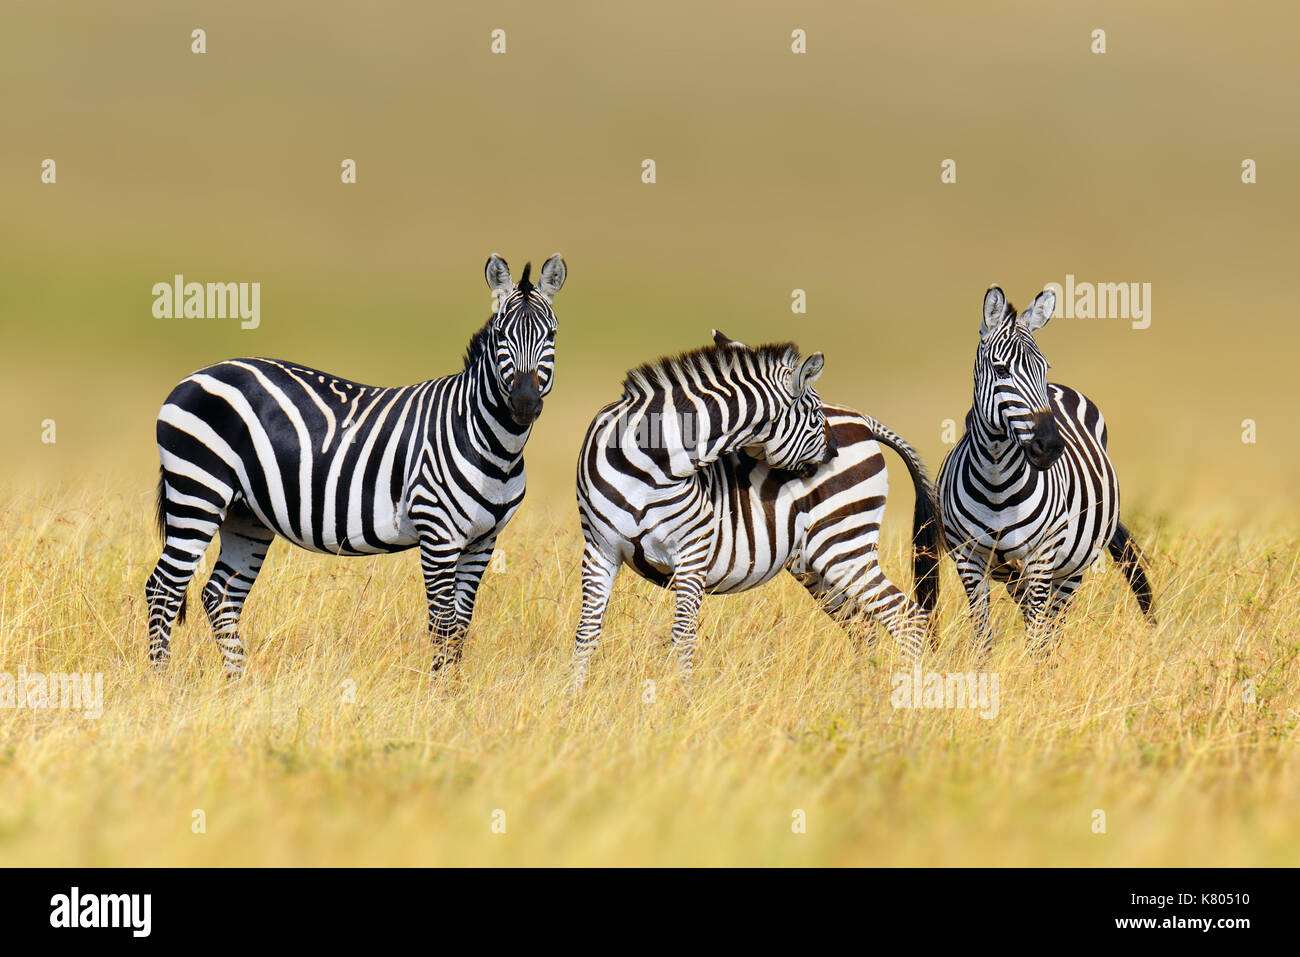 Zebra in erba habitat Natura, parco nazionale del Kenya. wildlife scena dalla natura, Africa Immagini Stock